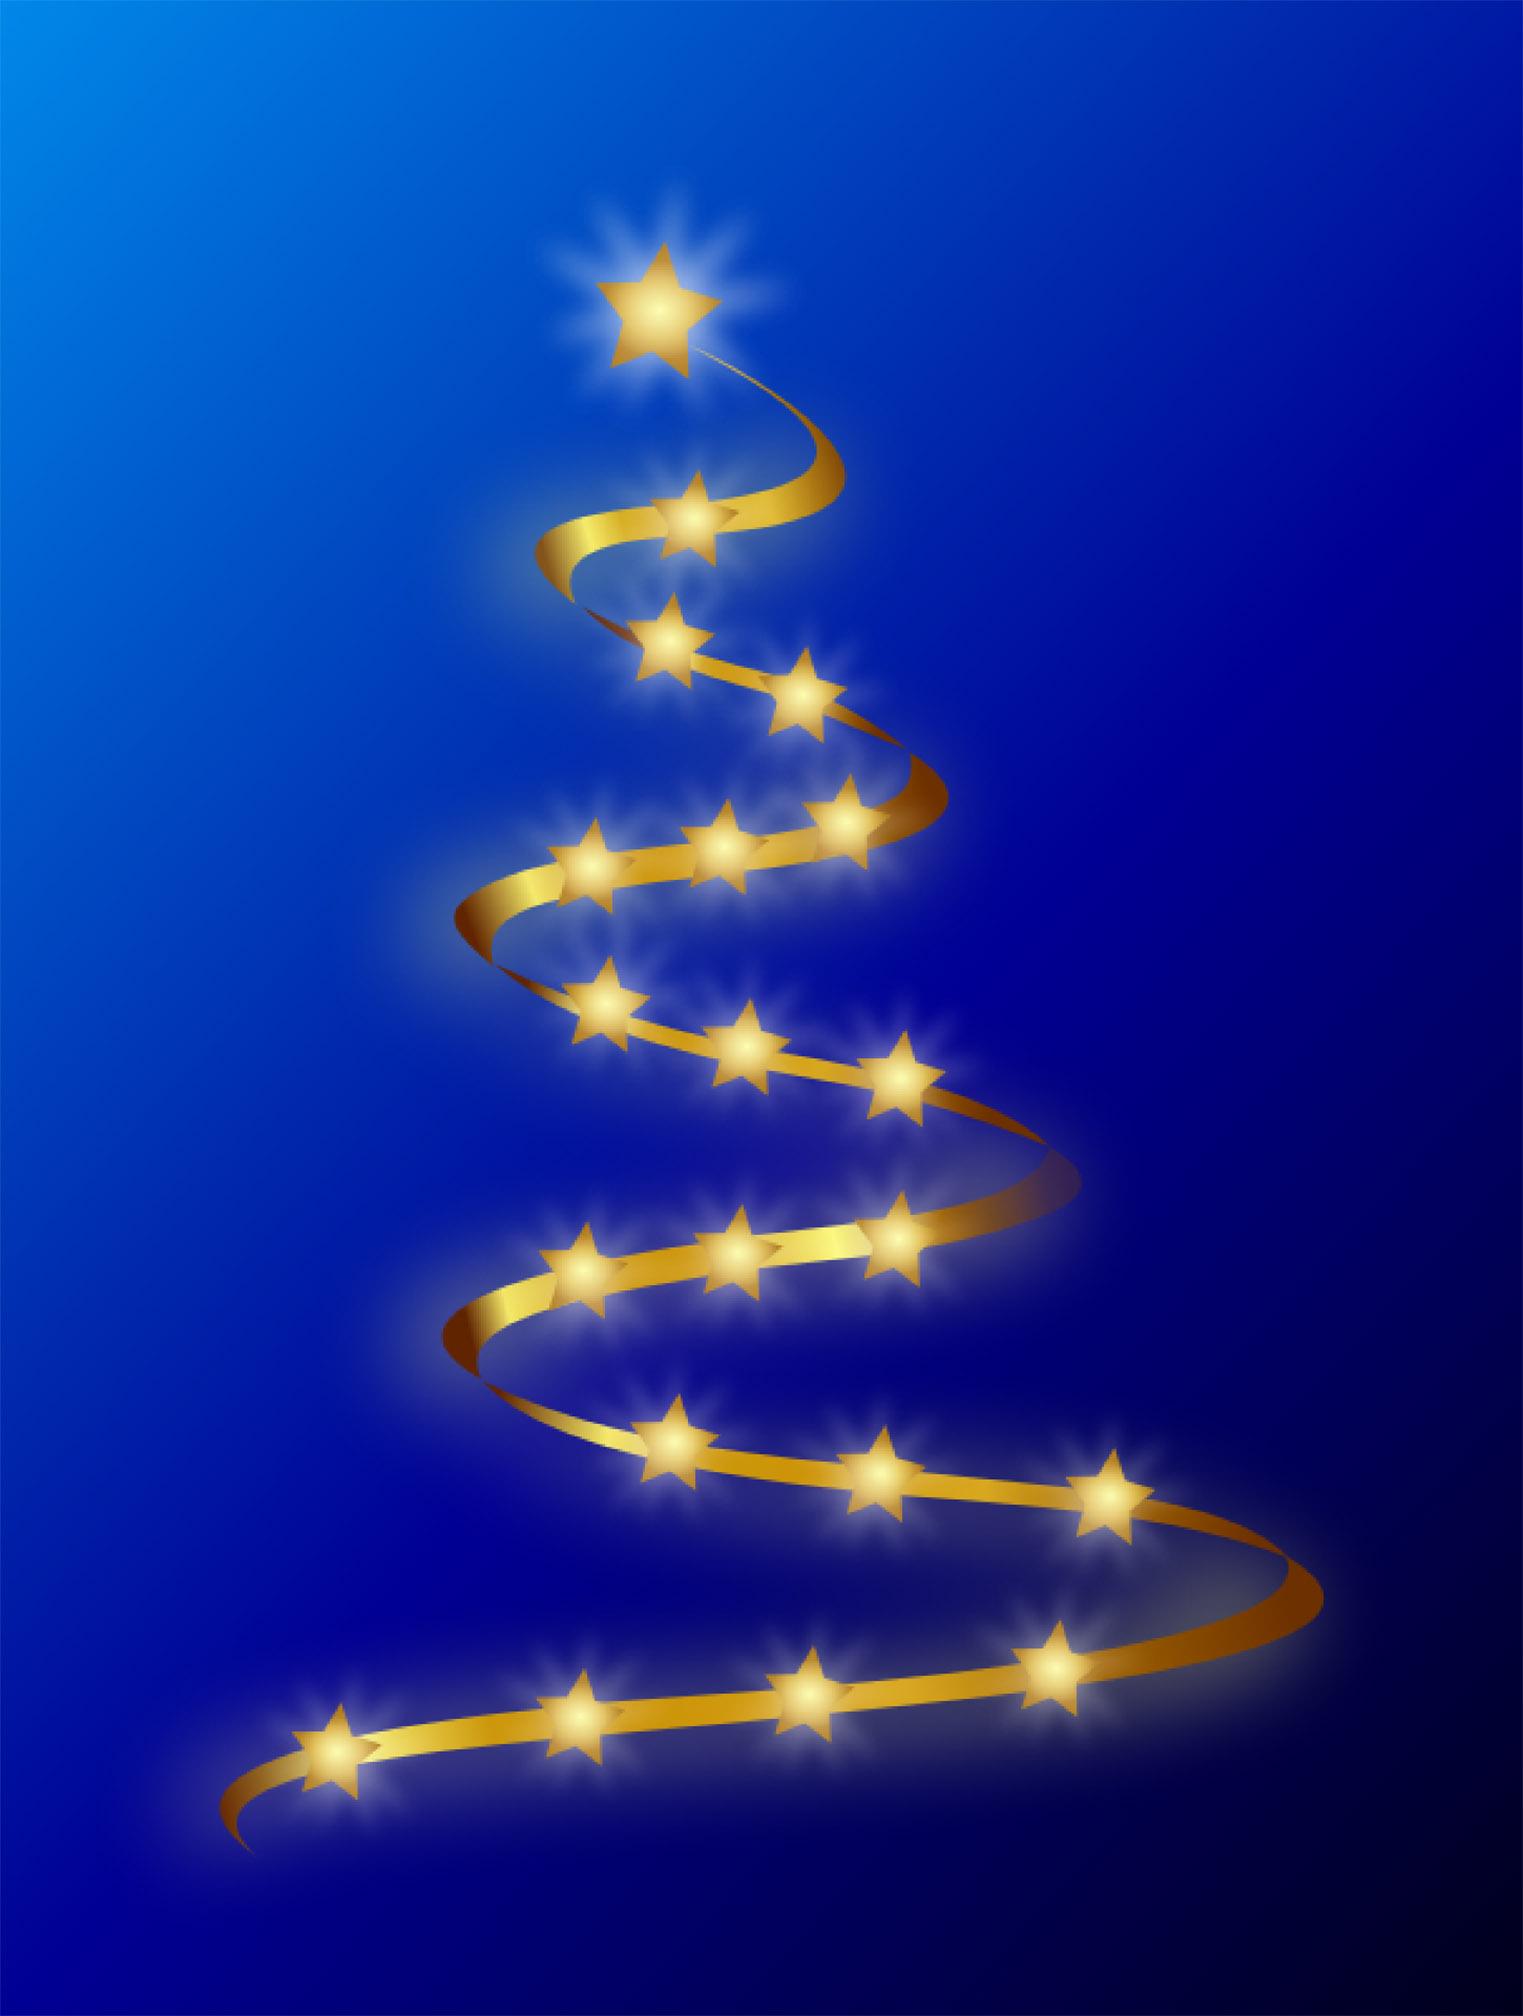 designer bathroom accessories melbourne picture on swirl christmas tree with designer bathroom accessories melbourne